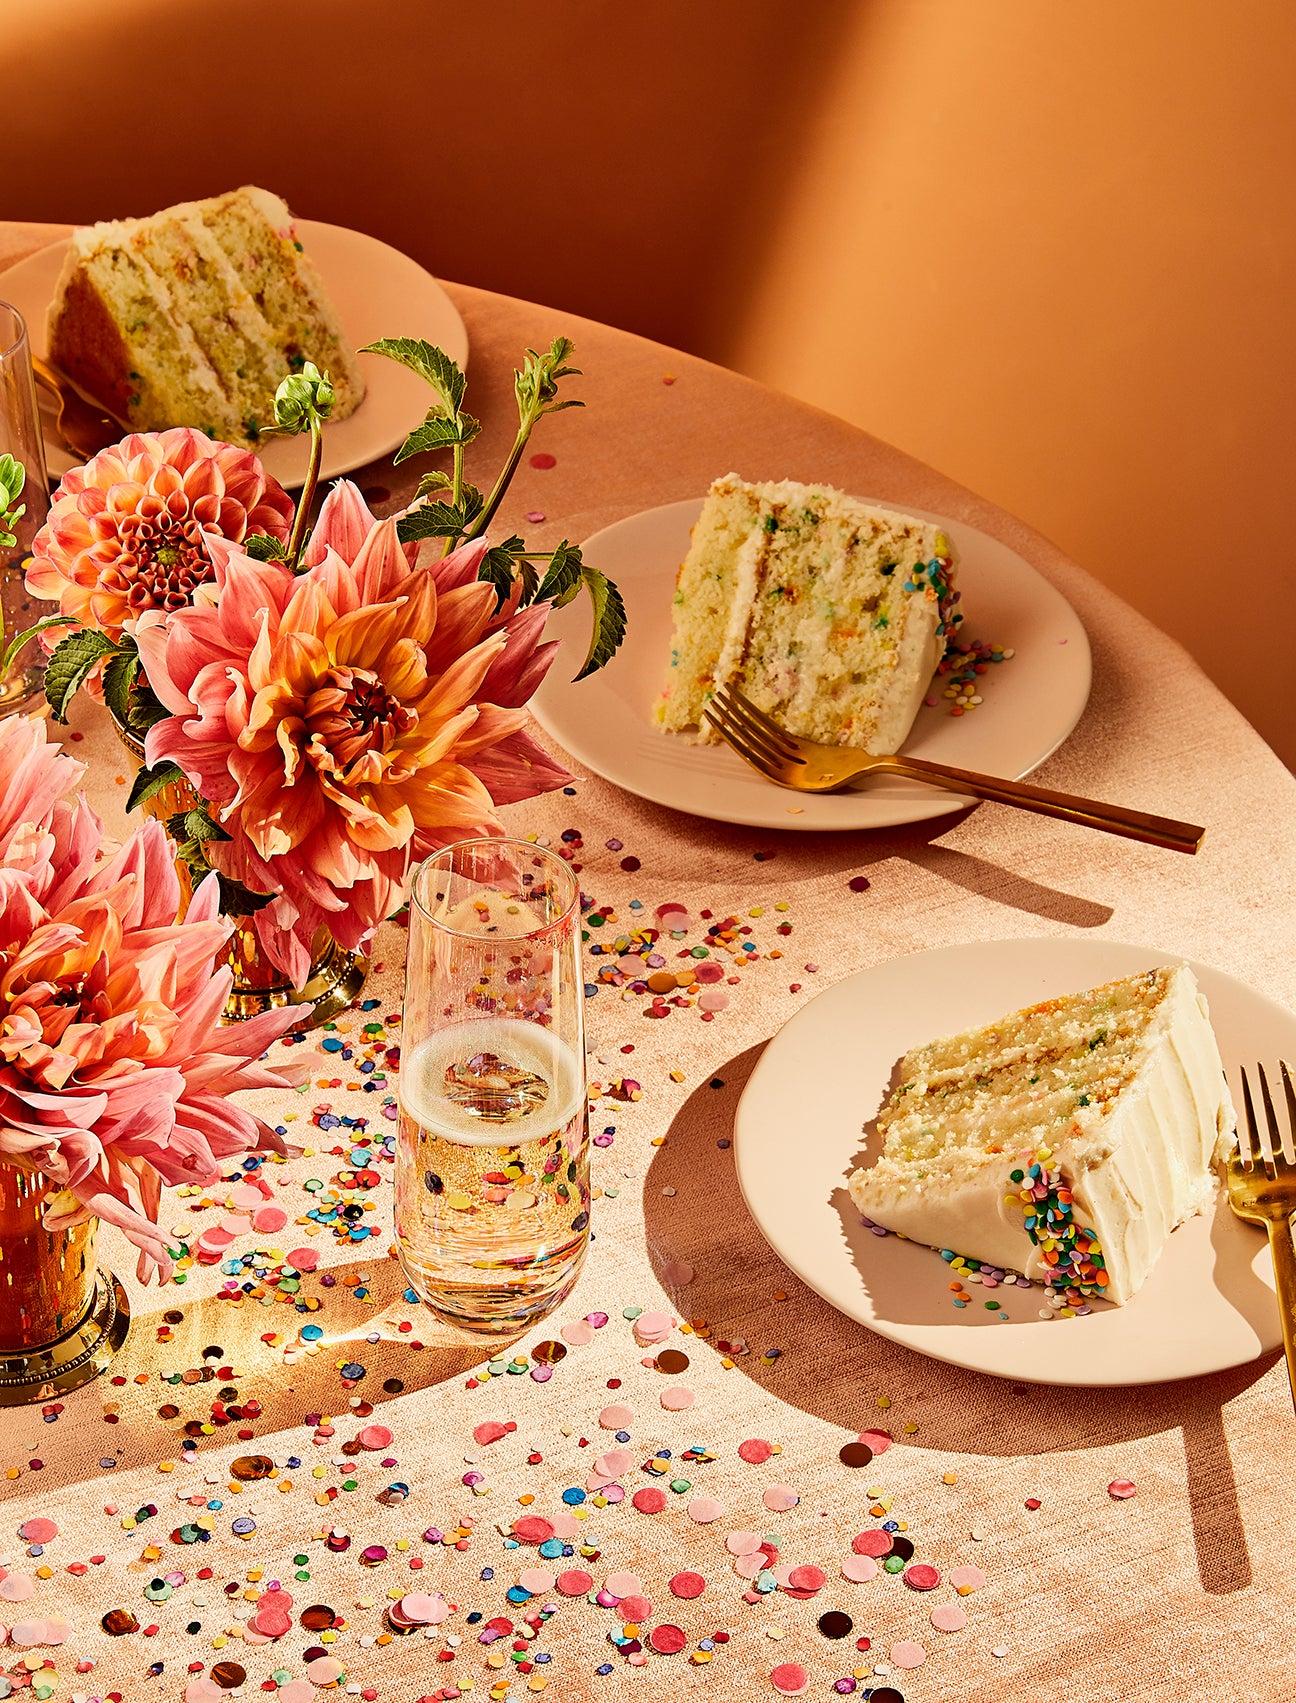 cake on plates